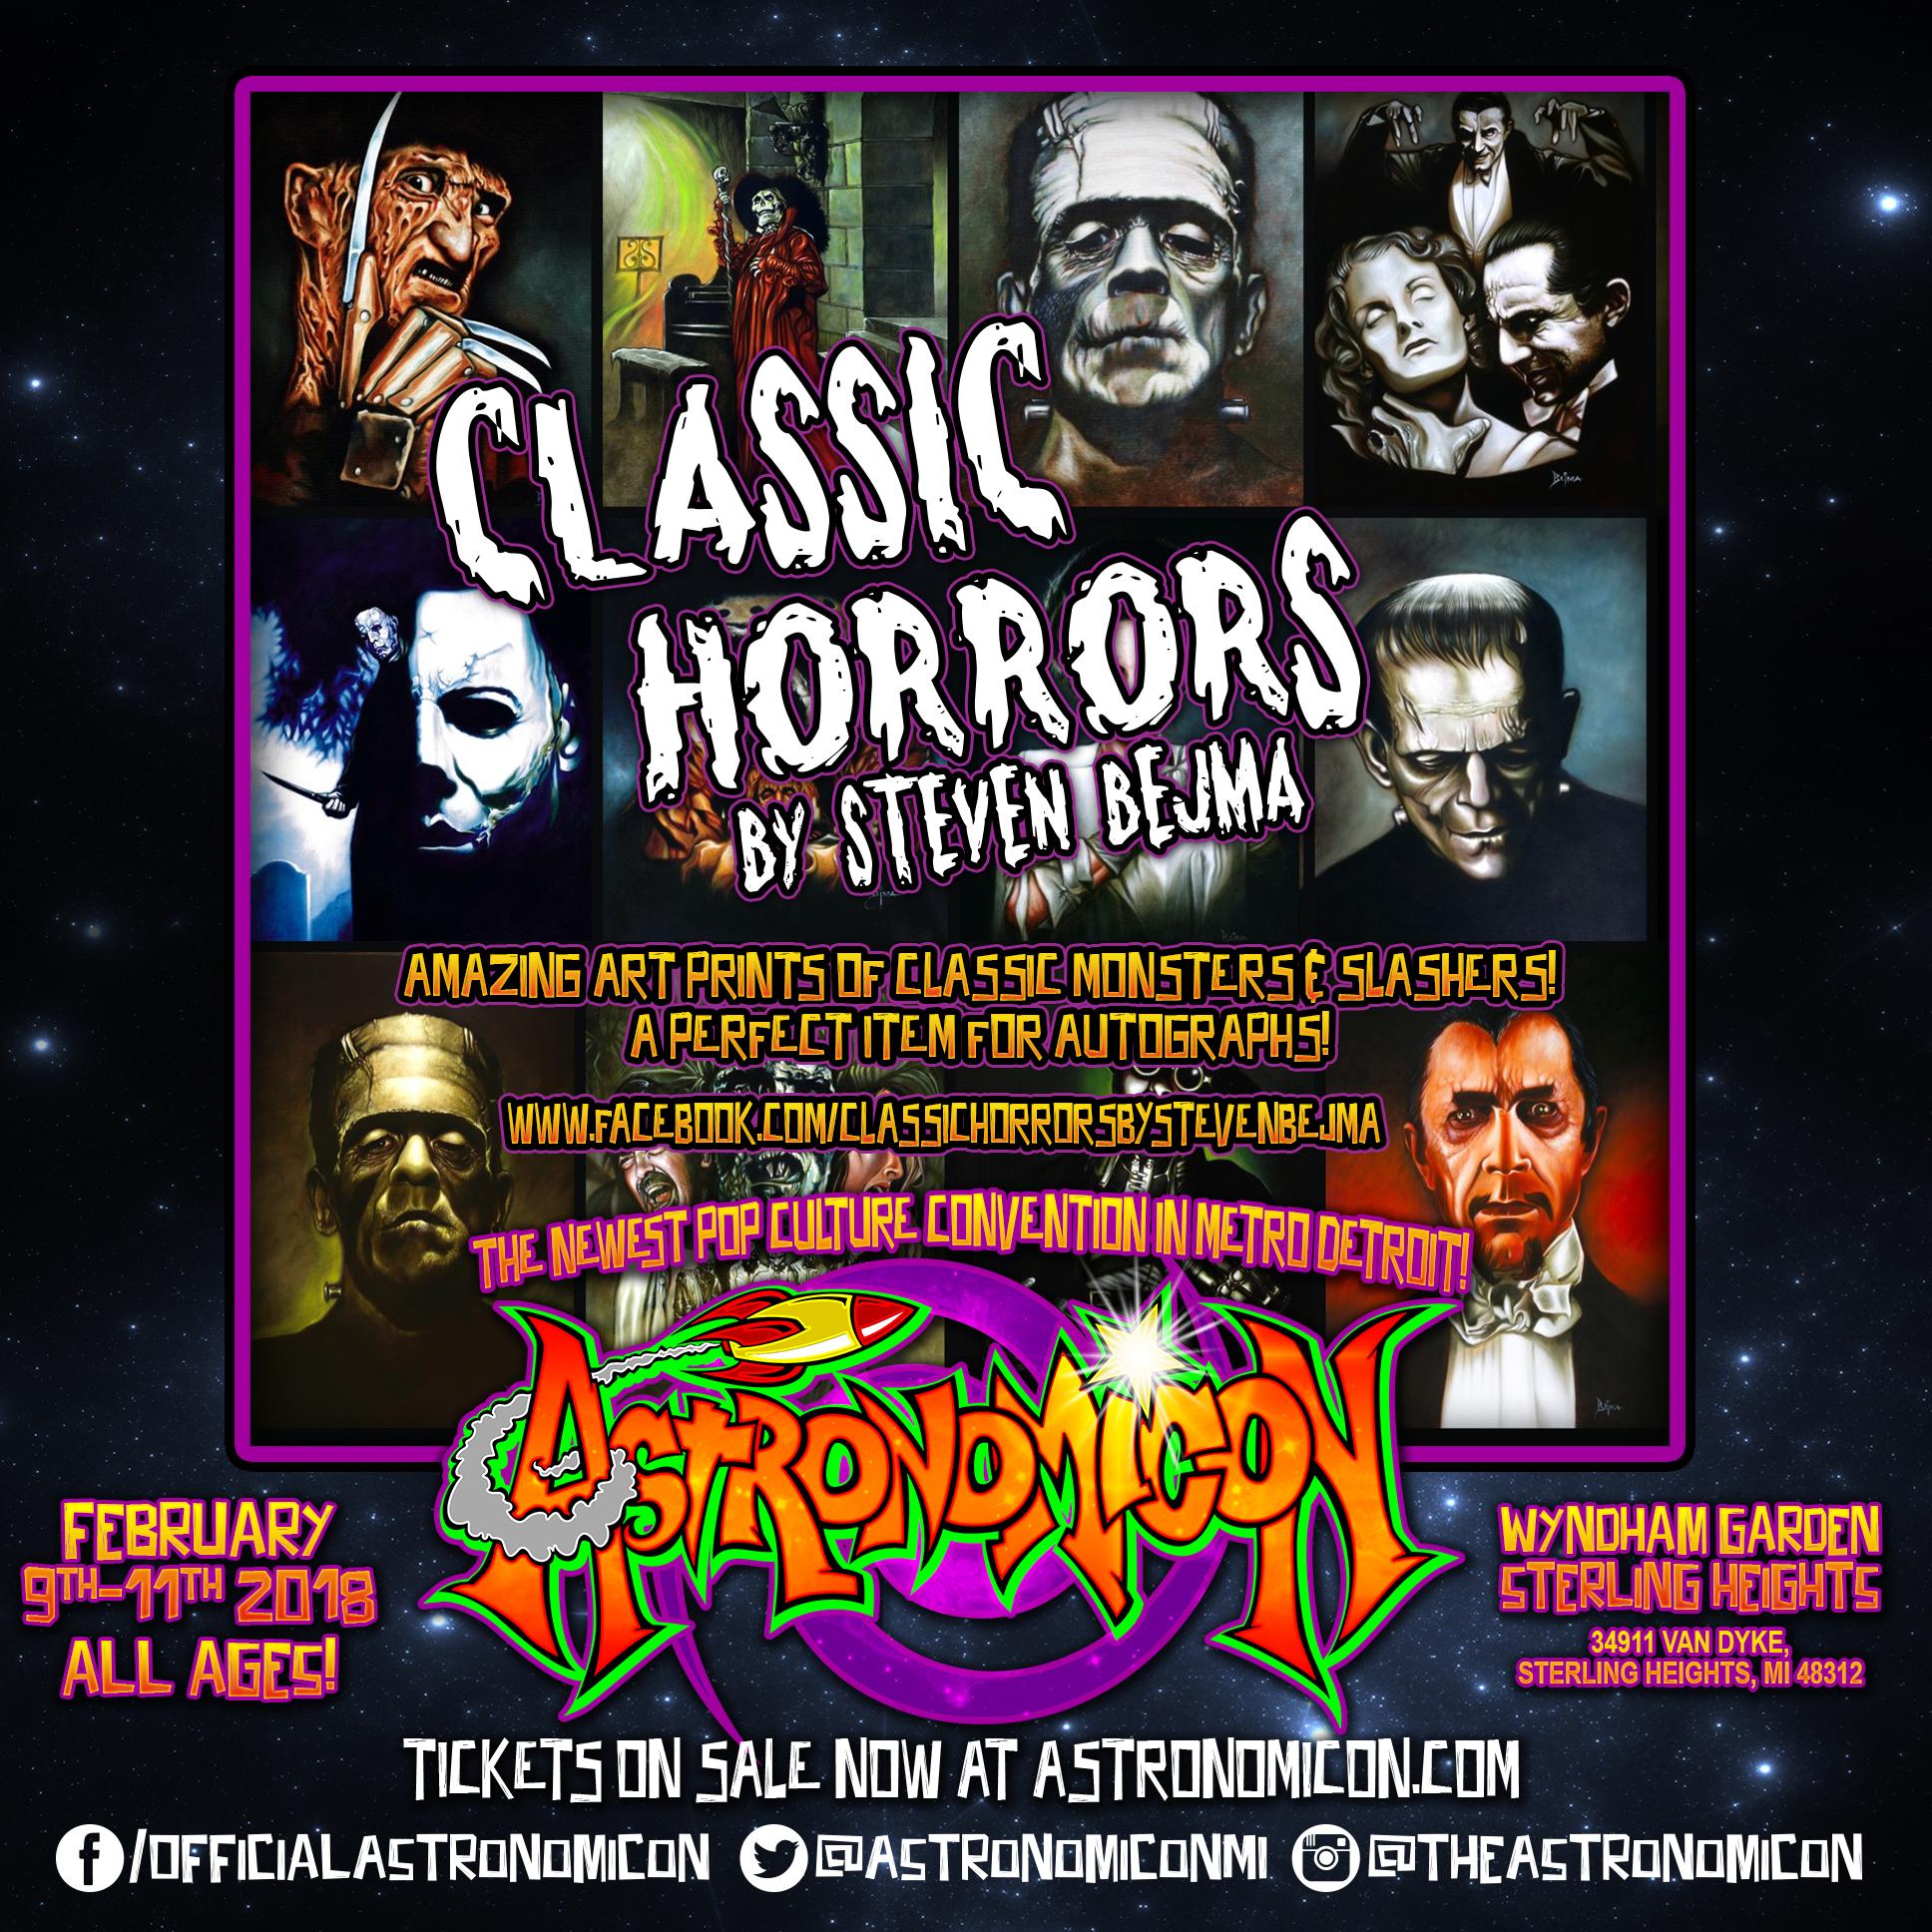 Classic Horror  s by Steven Bejma - https://www.facebook.com/classichorrorsbystevenbejma/